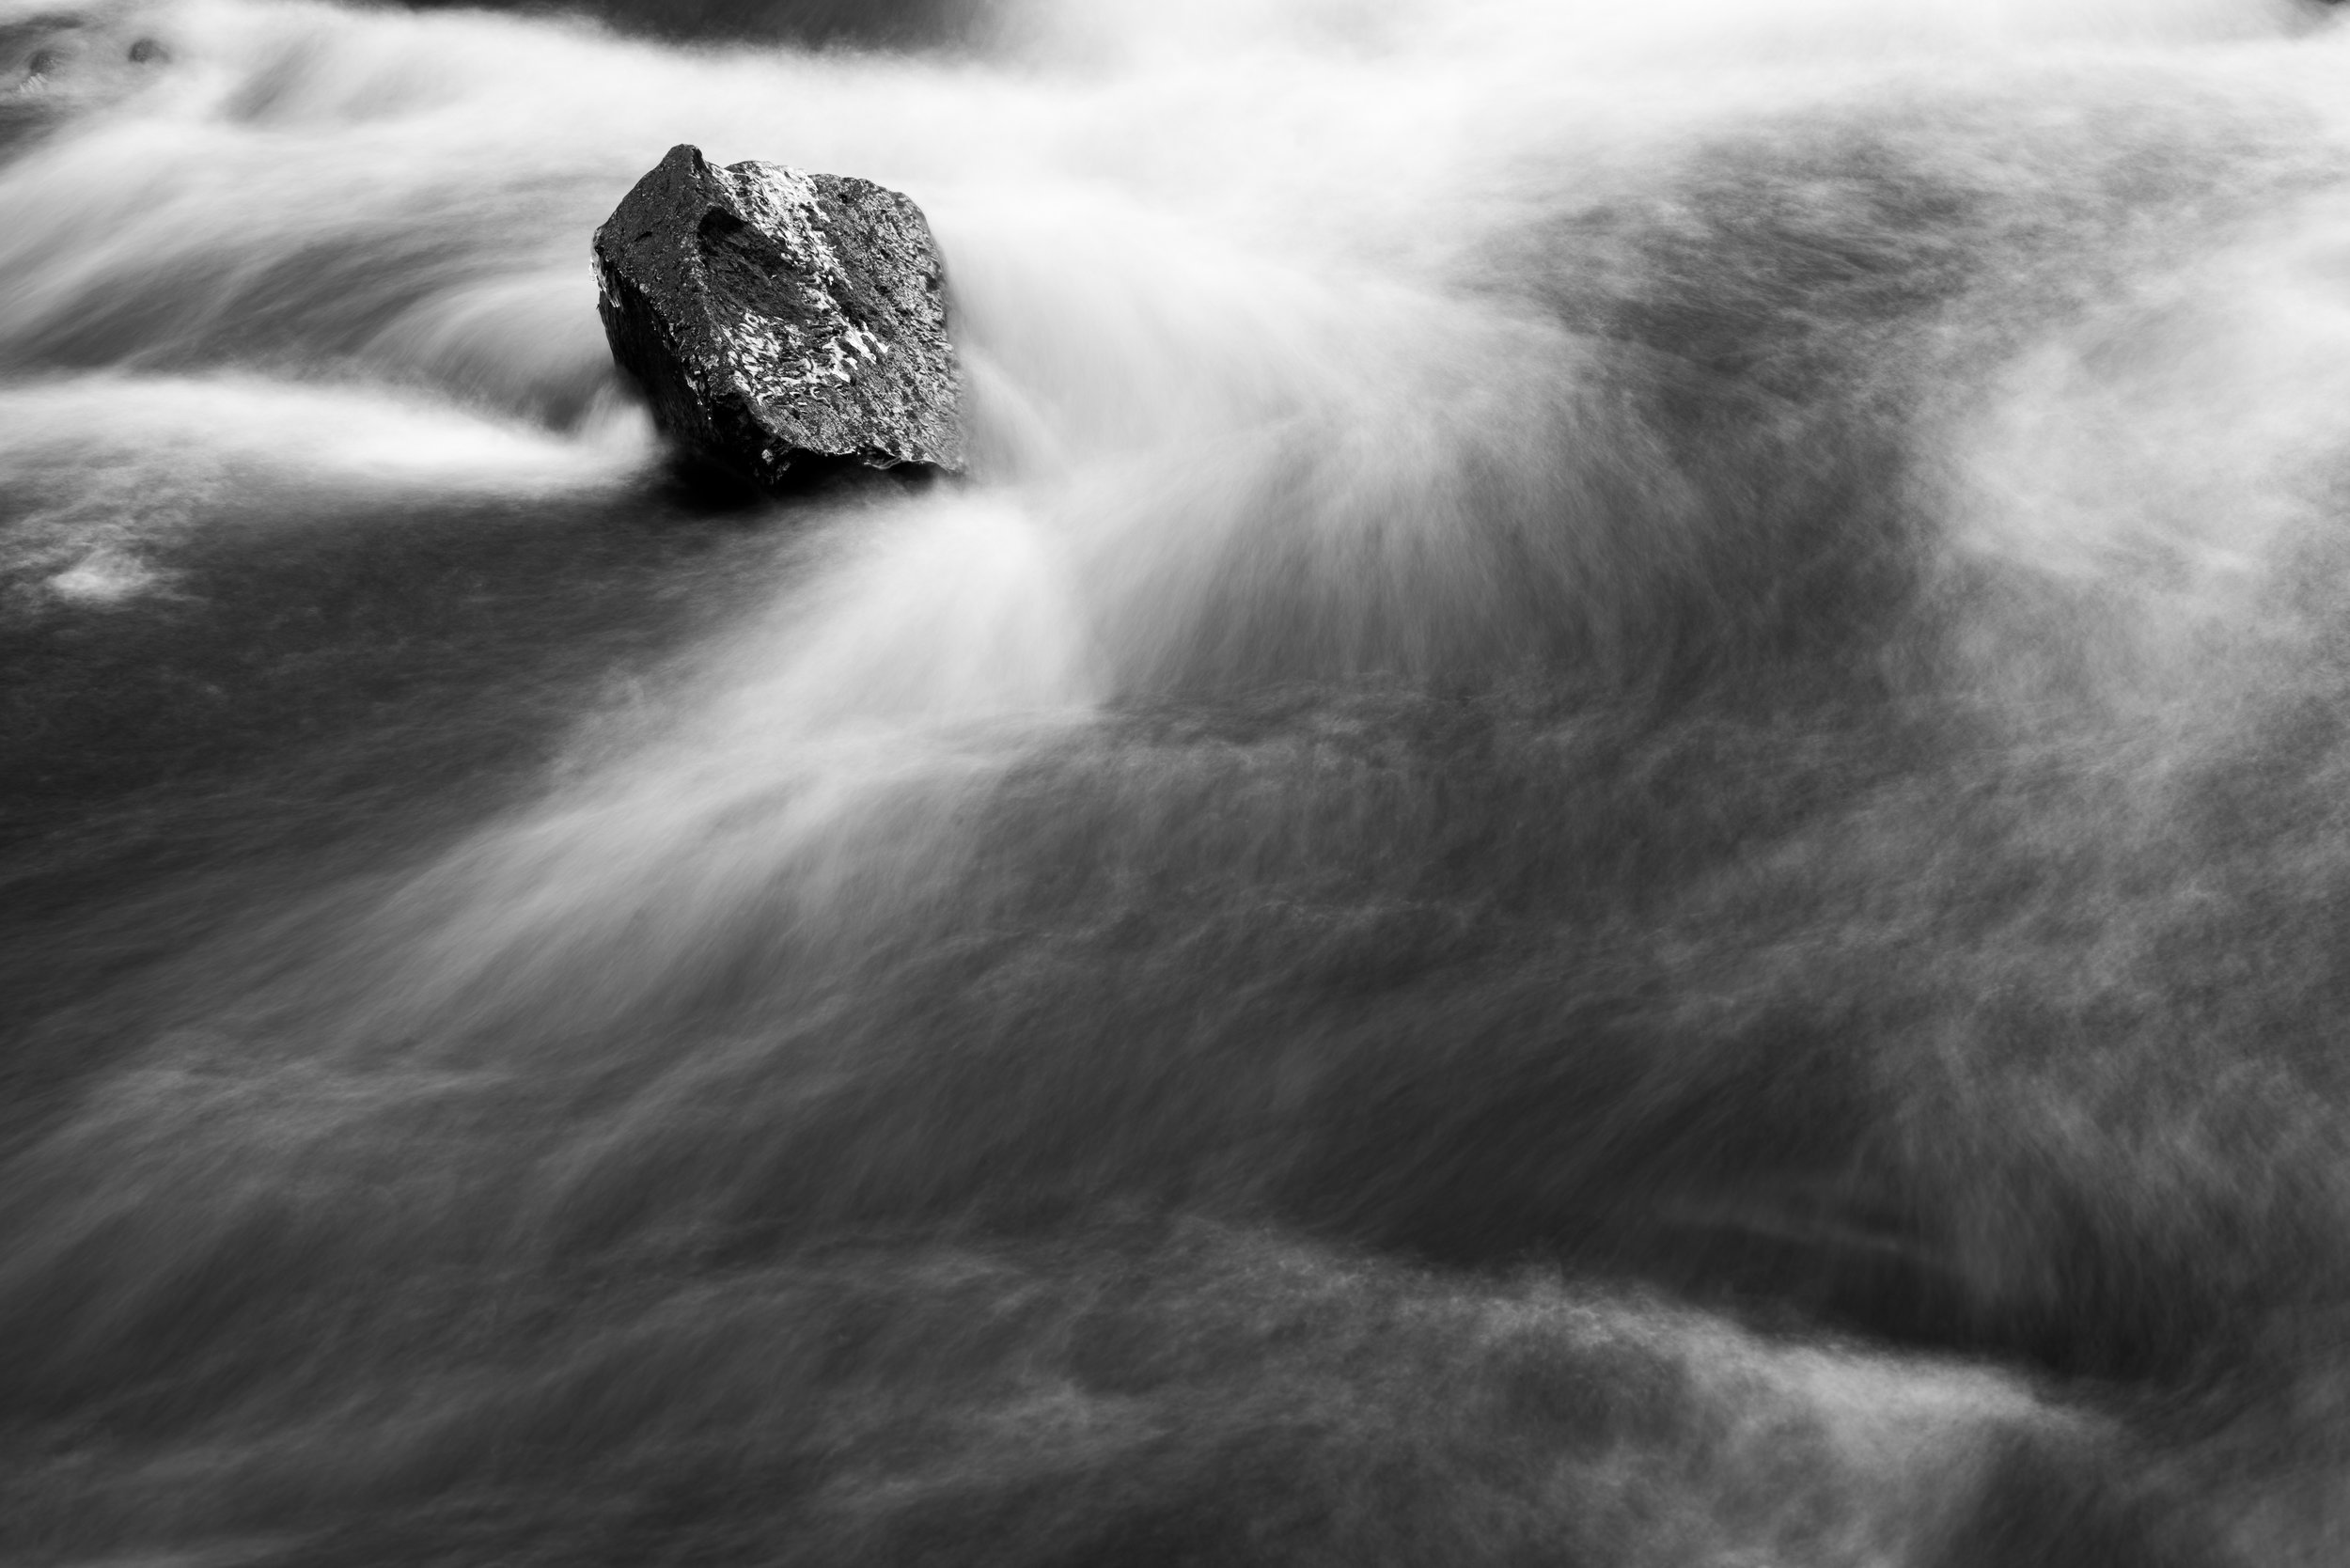 lone_boulder_waterfall.jpg